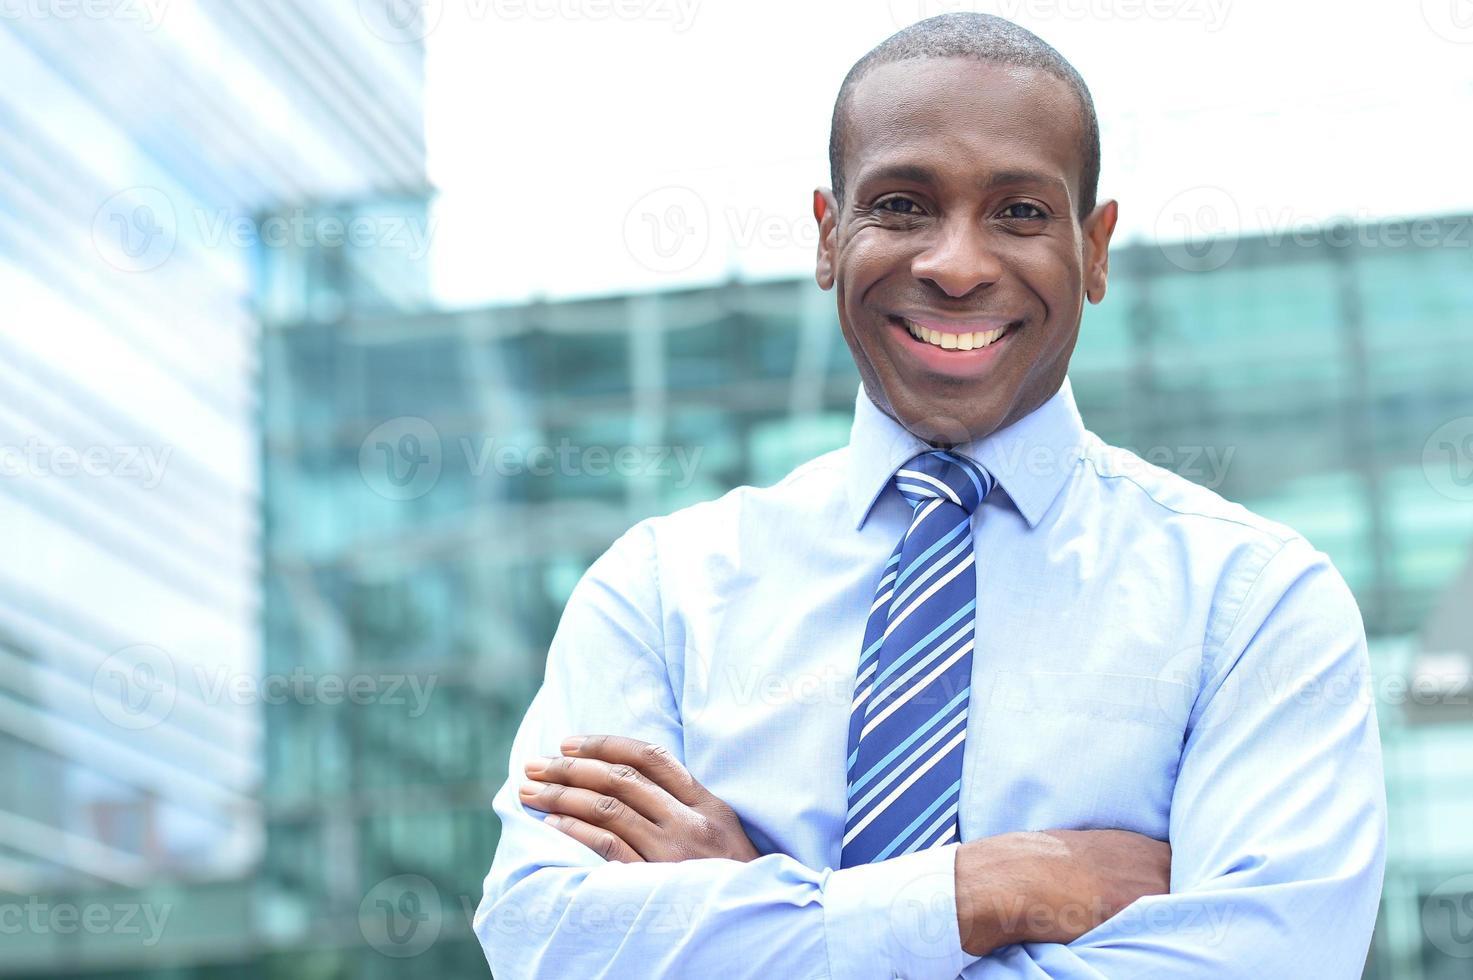 dirigente maschio sorridente all'aperto foto